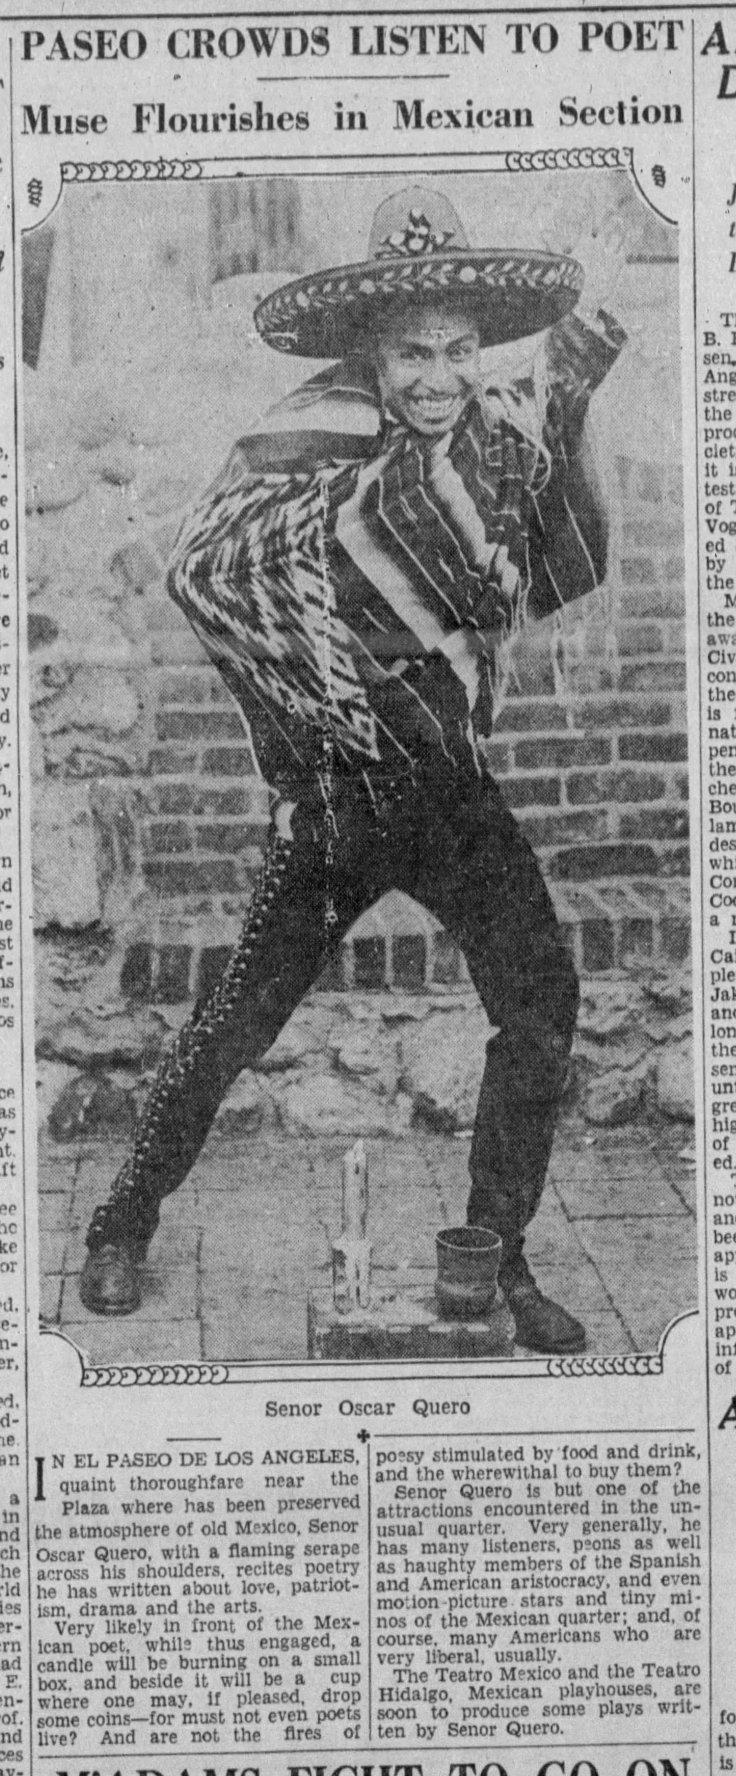 teatro hidalgo times_sep_8__1930_